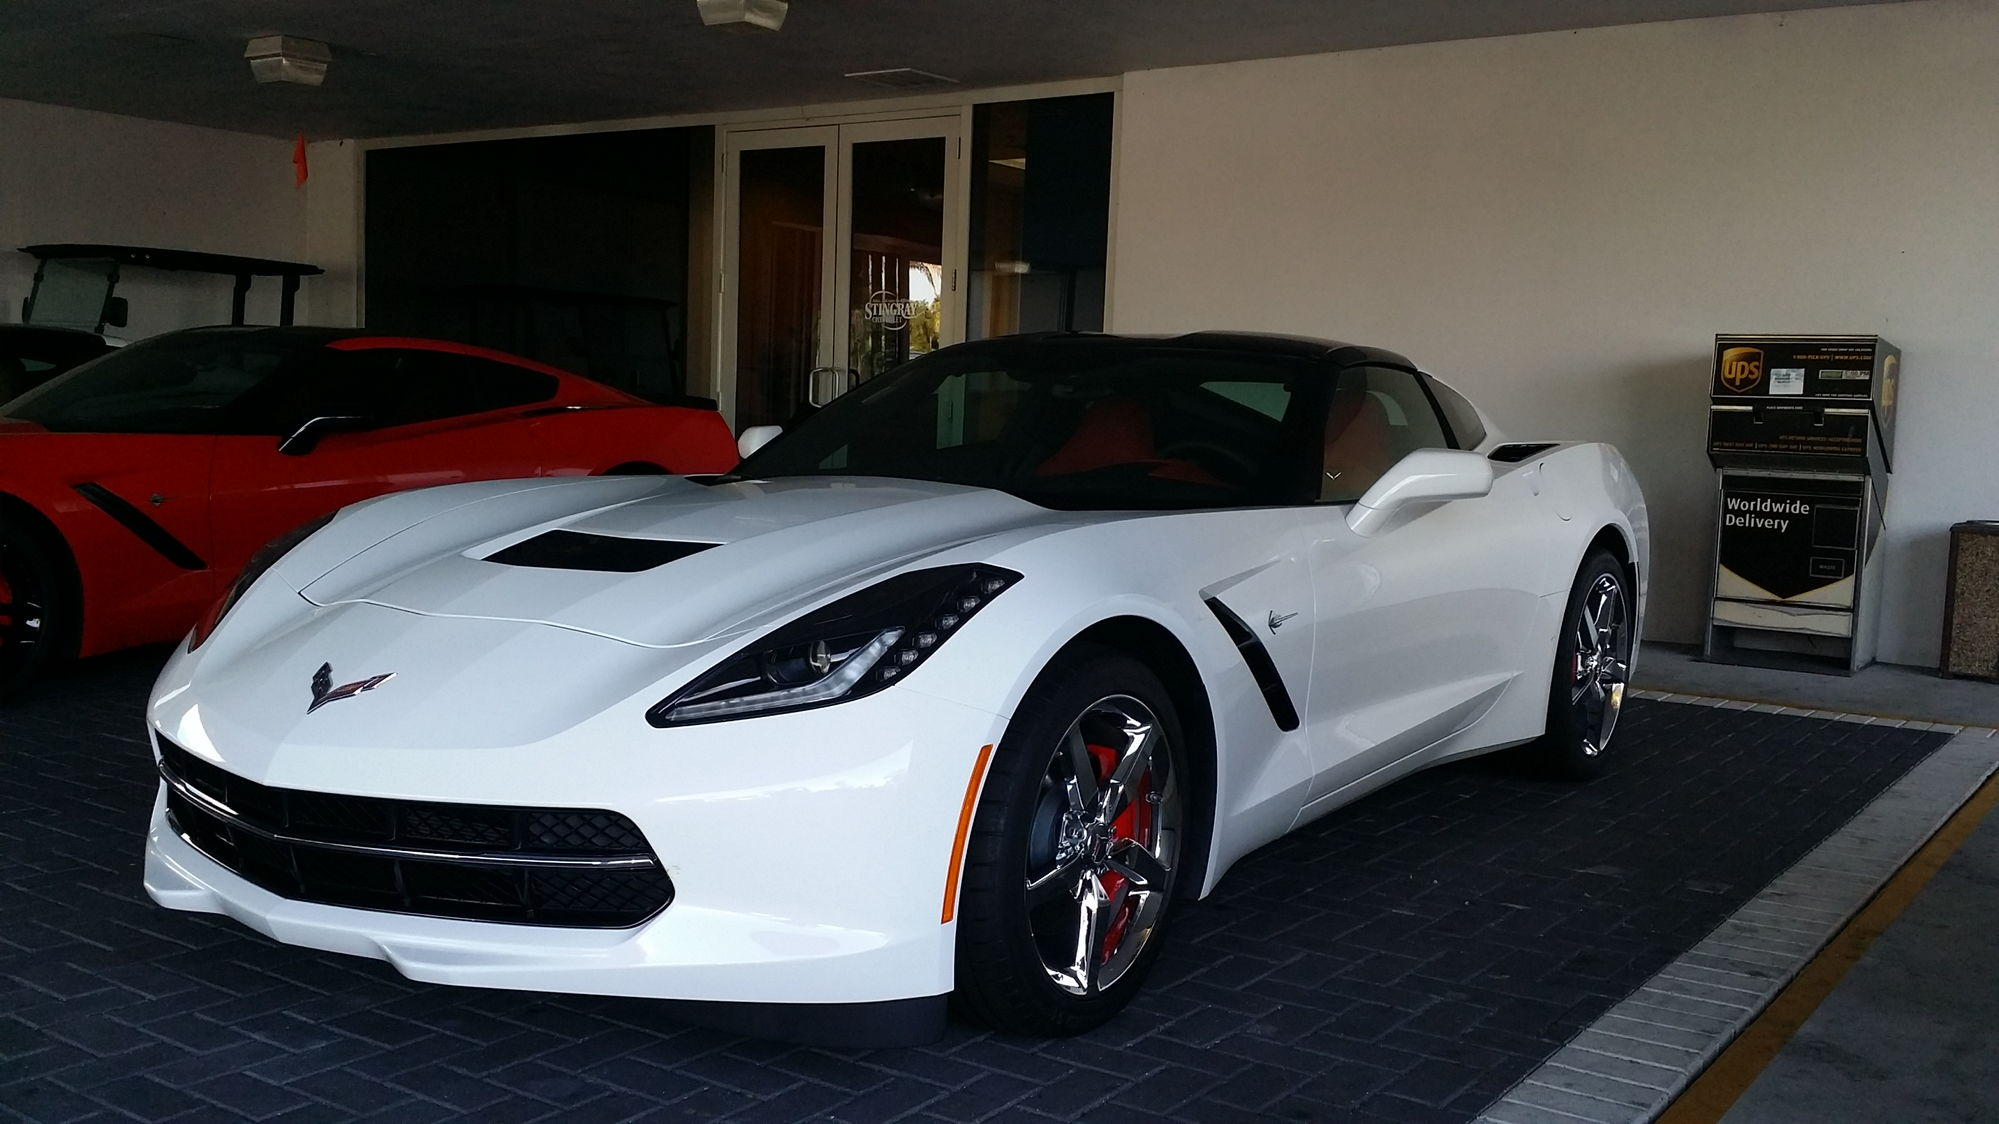 Available 2015 corvettes at stingray chevrolet plant city 2014 corvette white with red interior